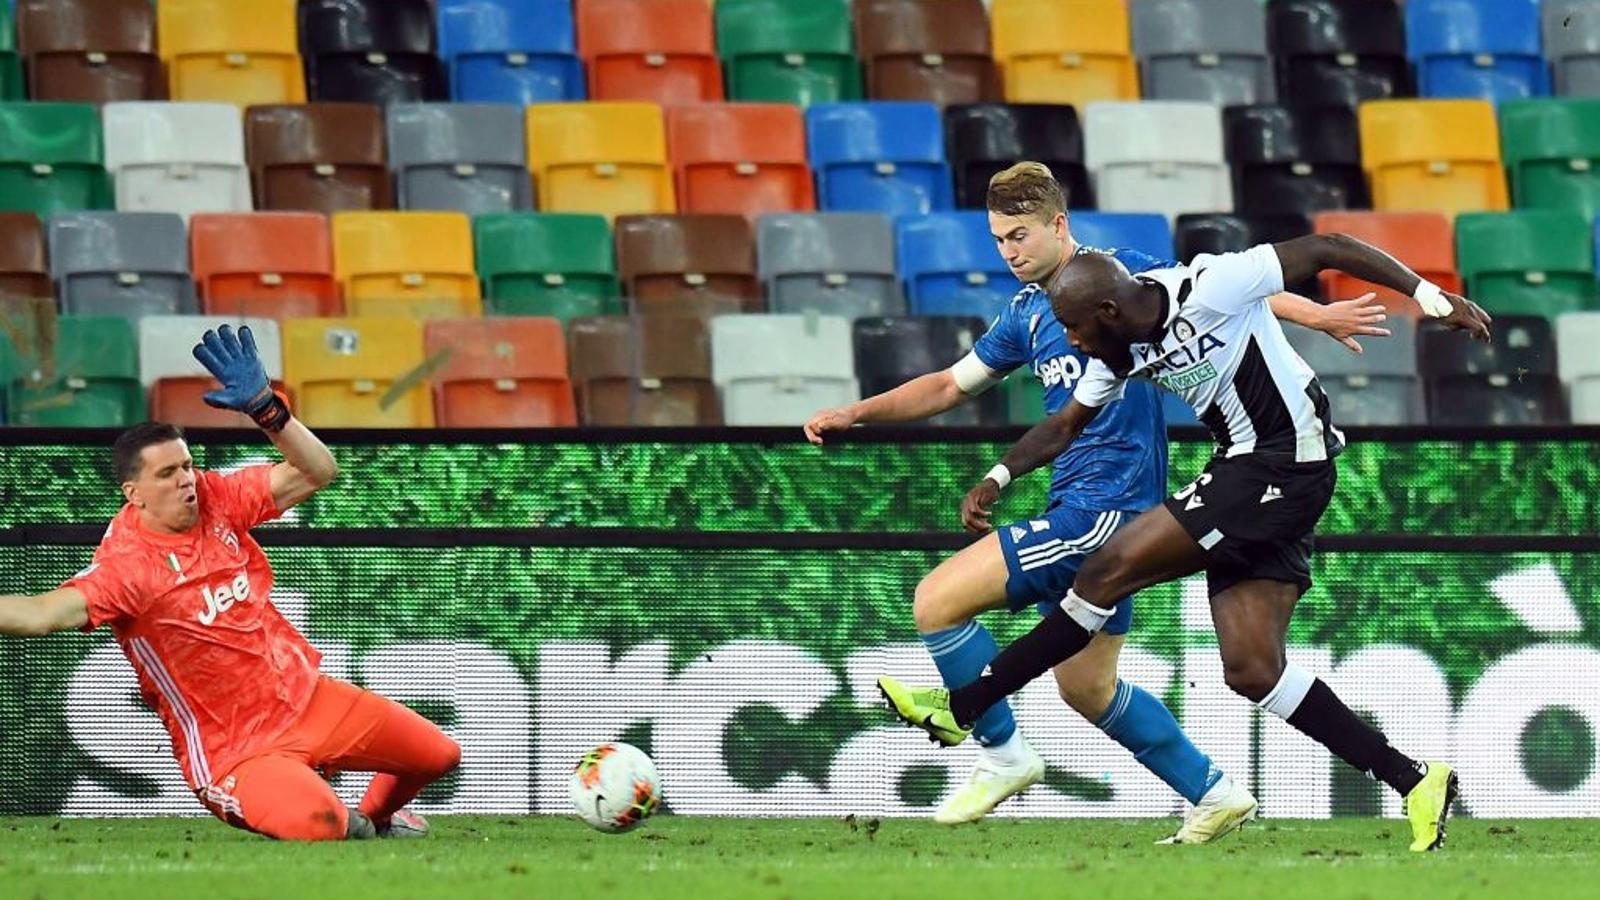 Udinese - Juventus 2-1 - Calcio - Rai Sport